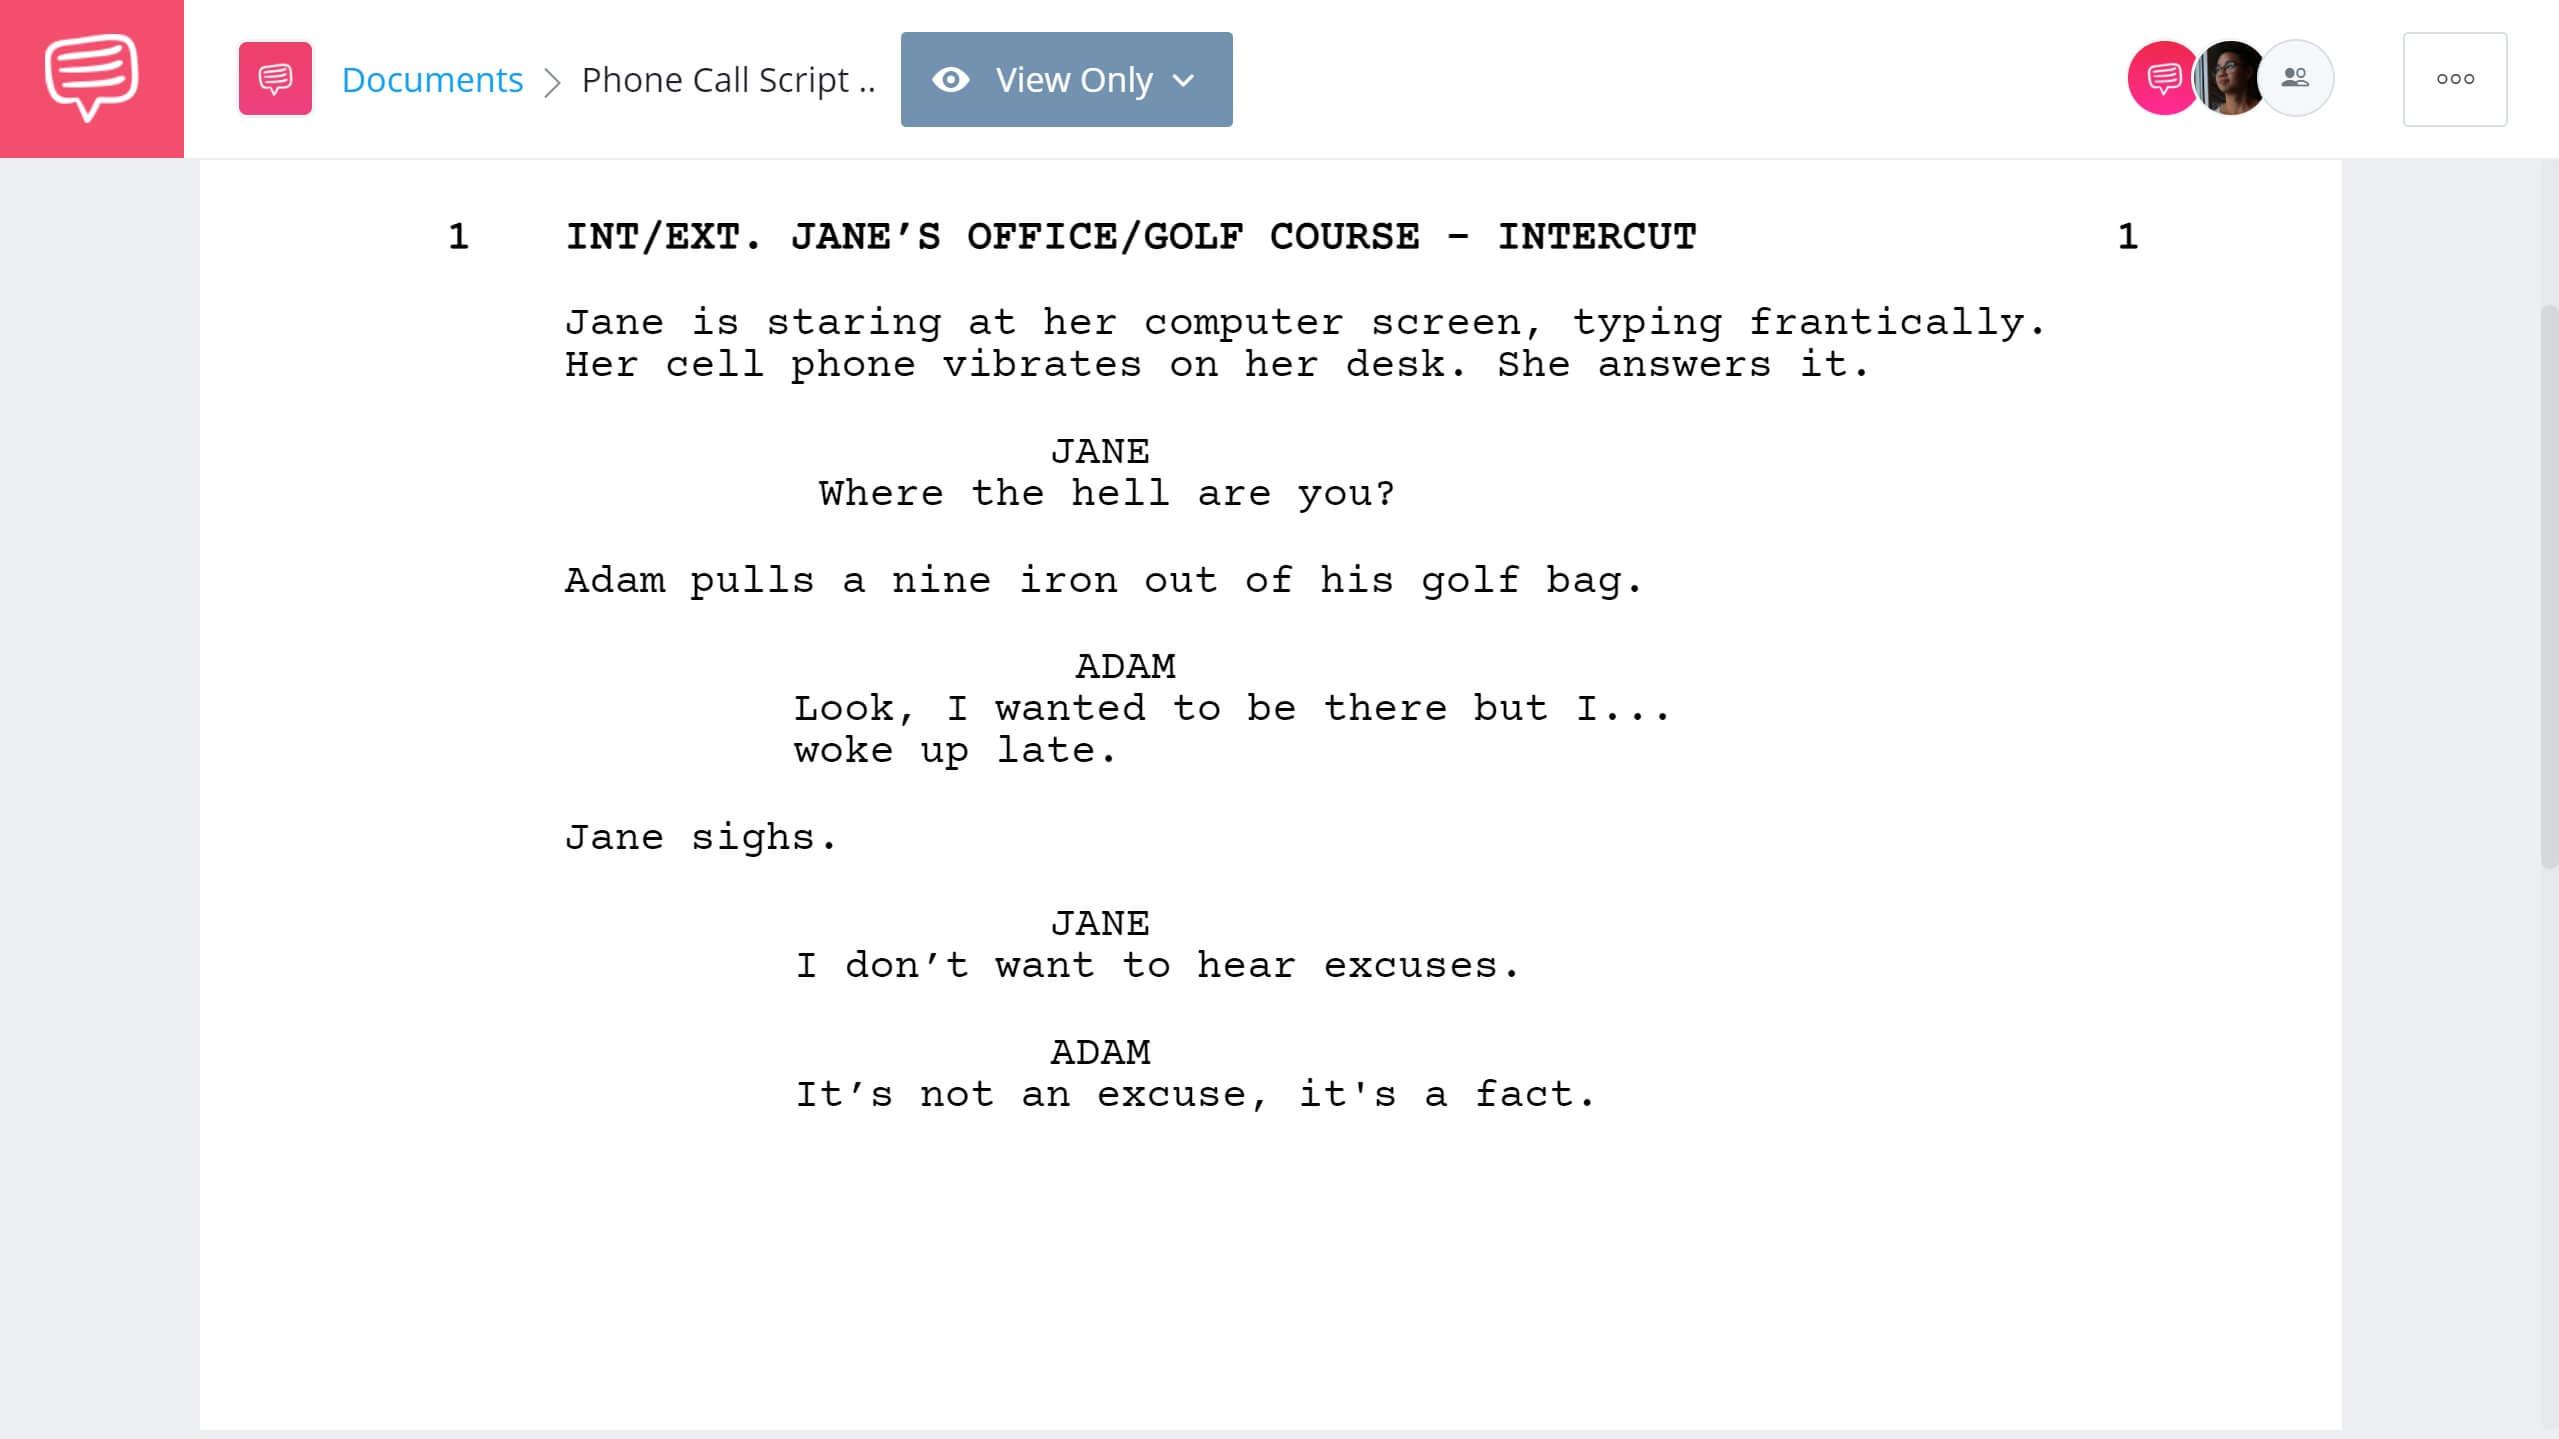 How to Write Telephone Conversation in Screenplay - Double Intercut Example - StudioBinder Screenwriting Software